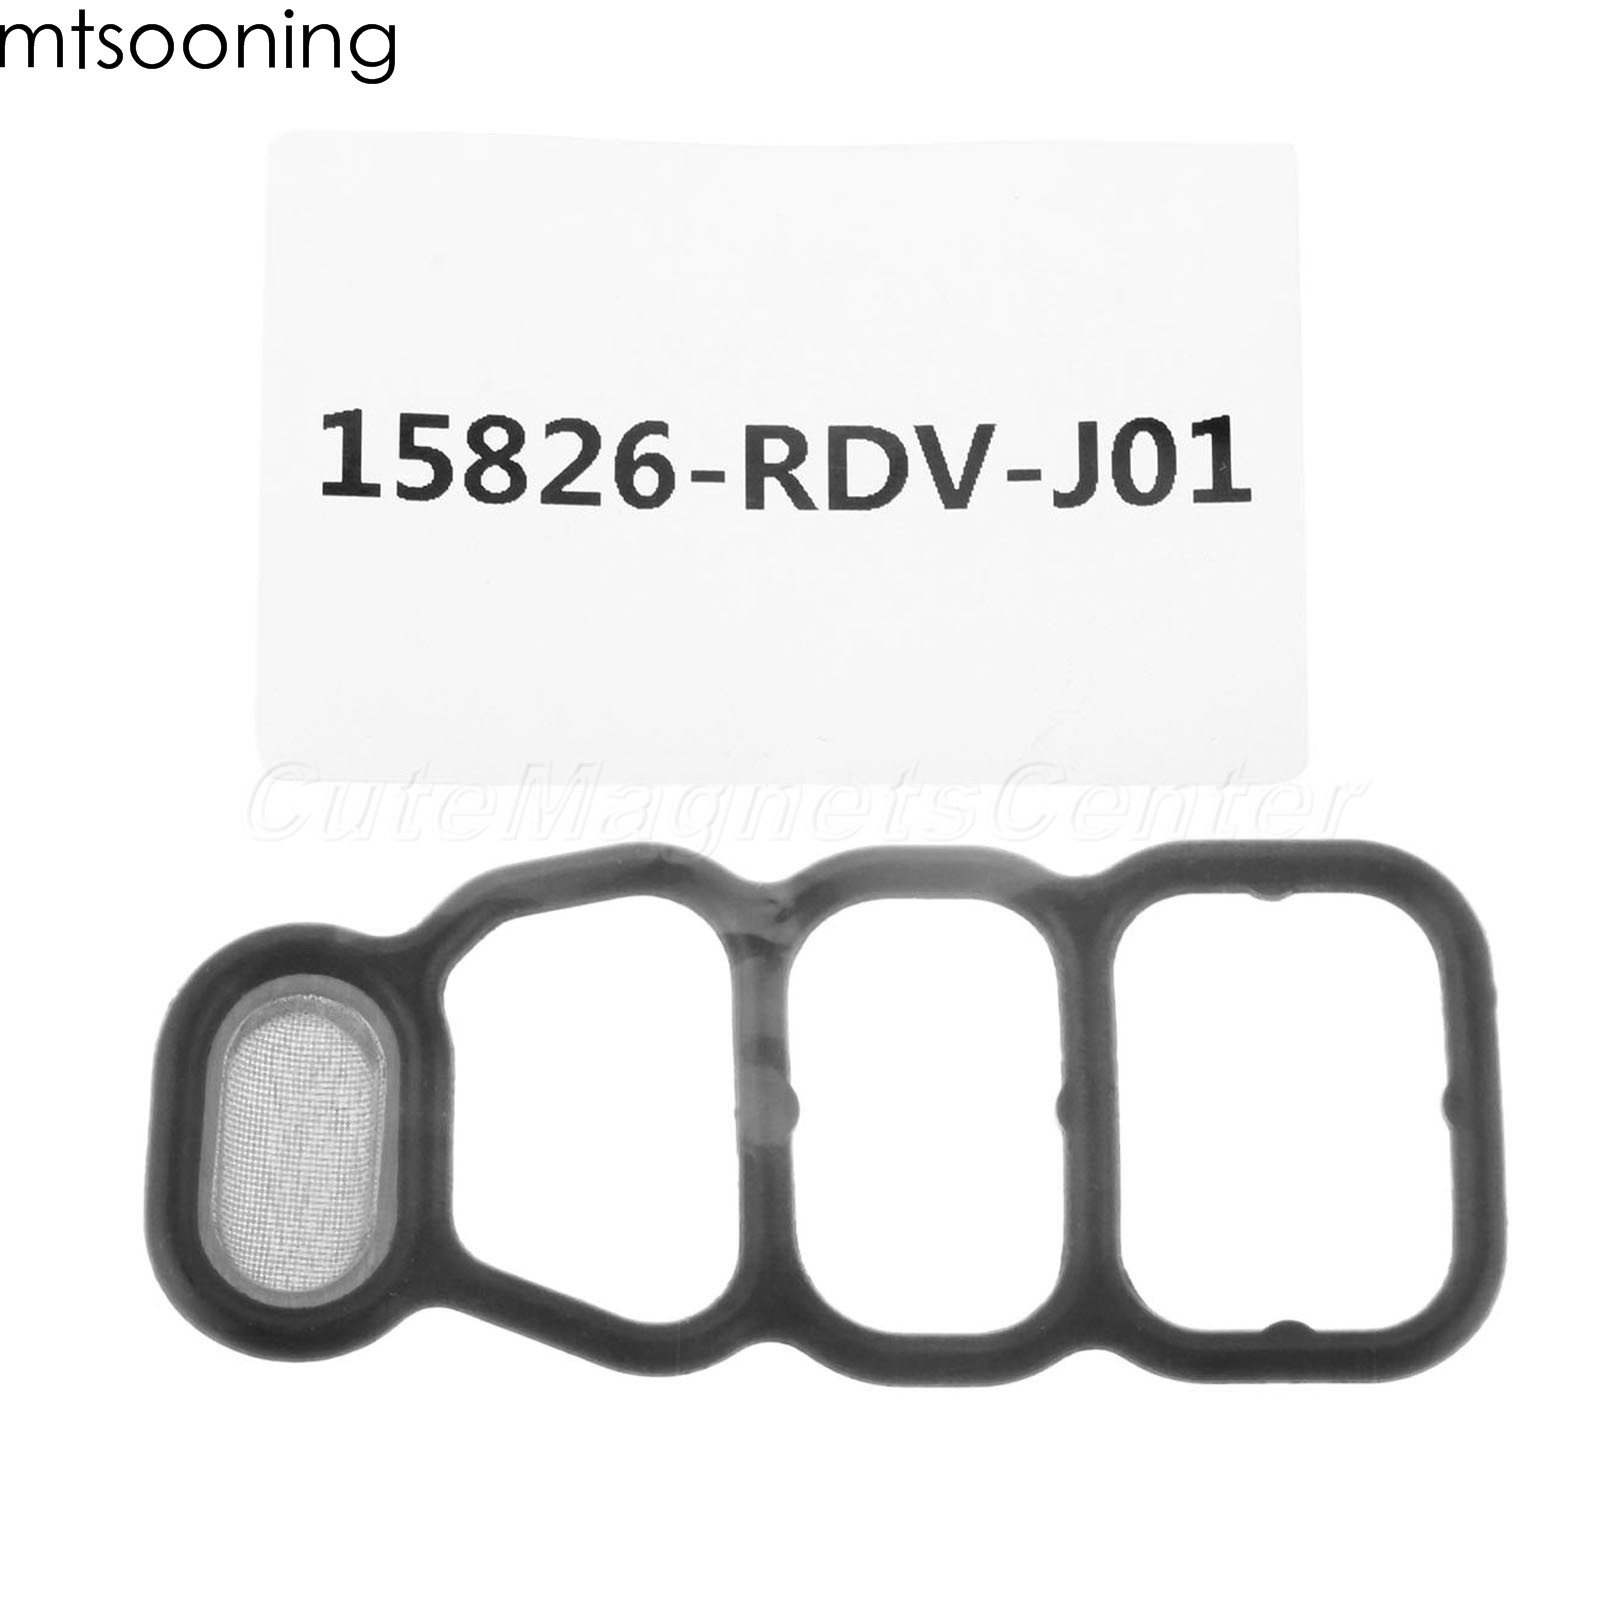 Car Solenoid Valve Spool Gasket VTEC Filter Screen Seal For Honda Odyssey Pilot 2WD Accord 2006 2007 15826-RDV-J01